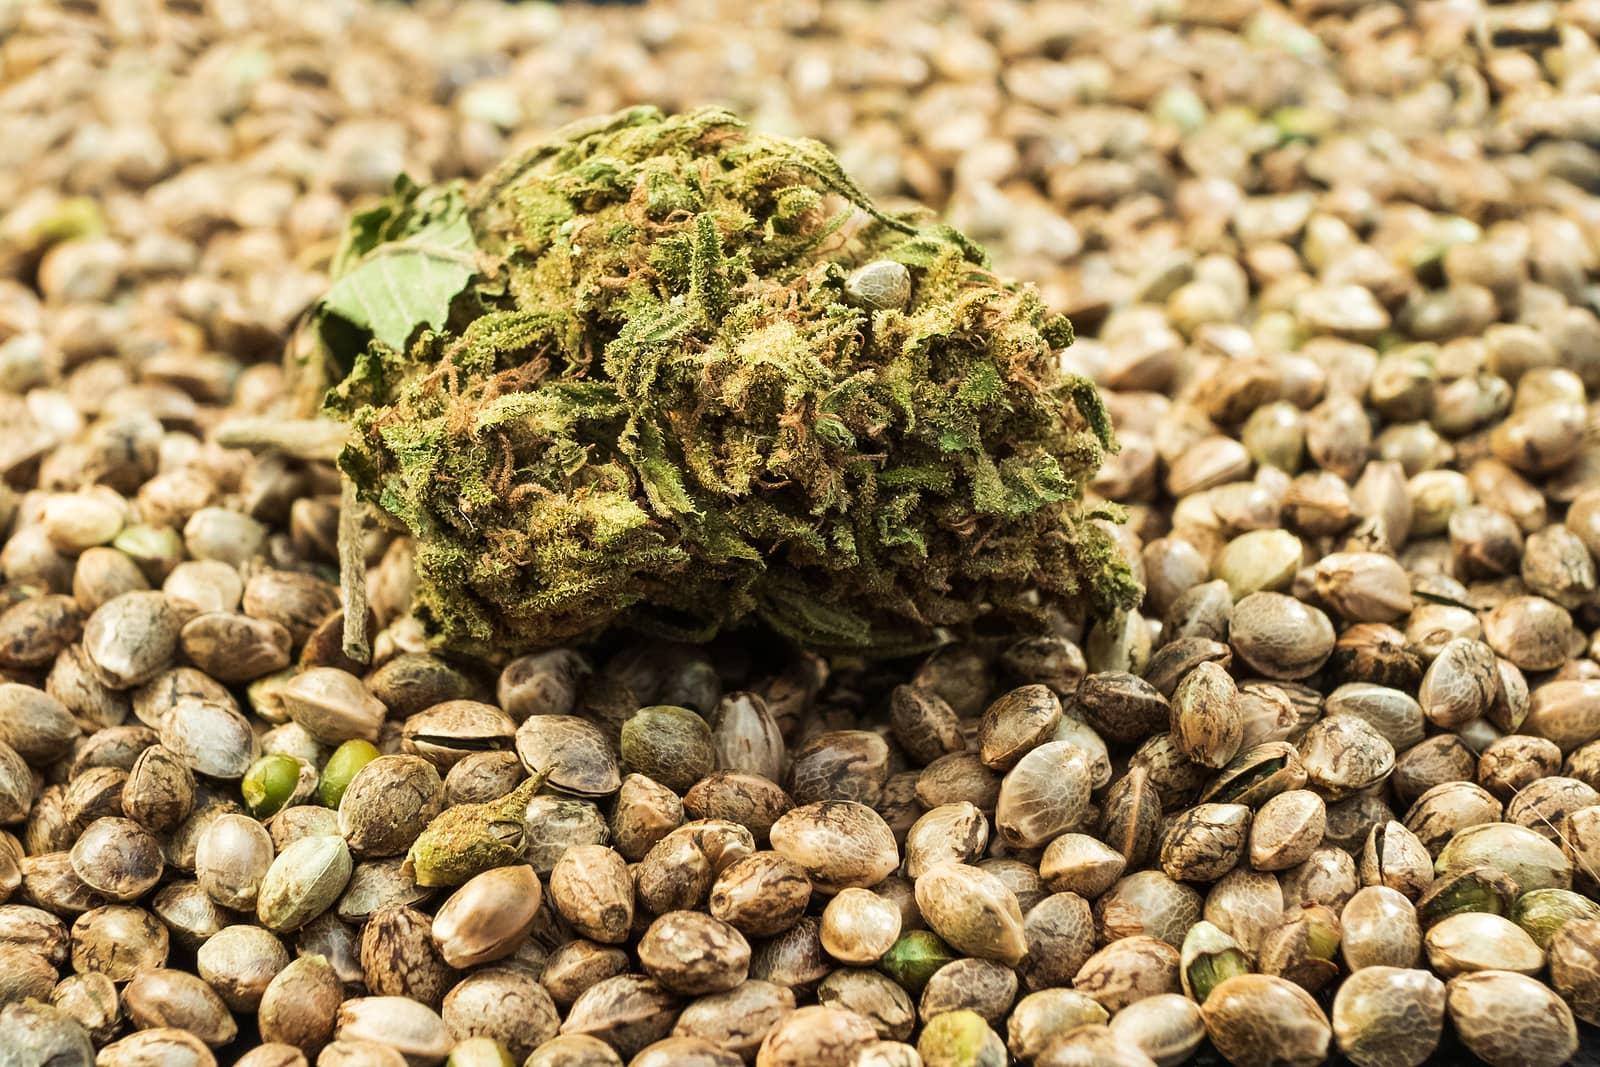 Marijuana Seeds for Sale in Vancouver